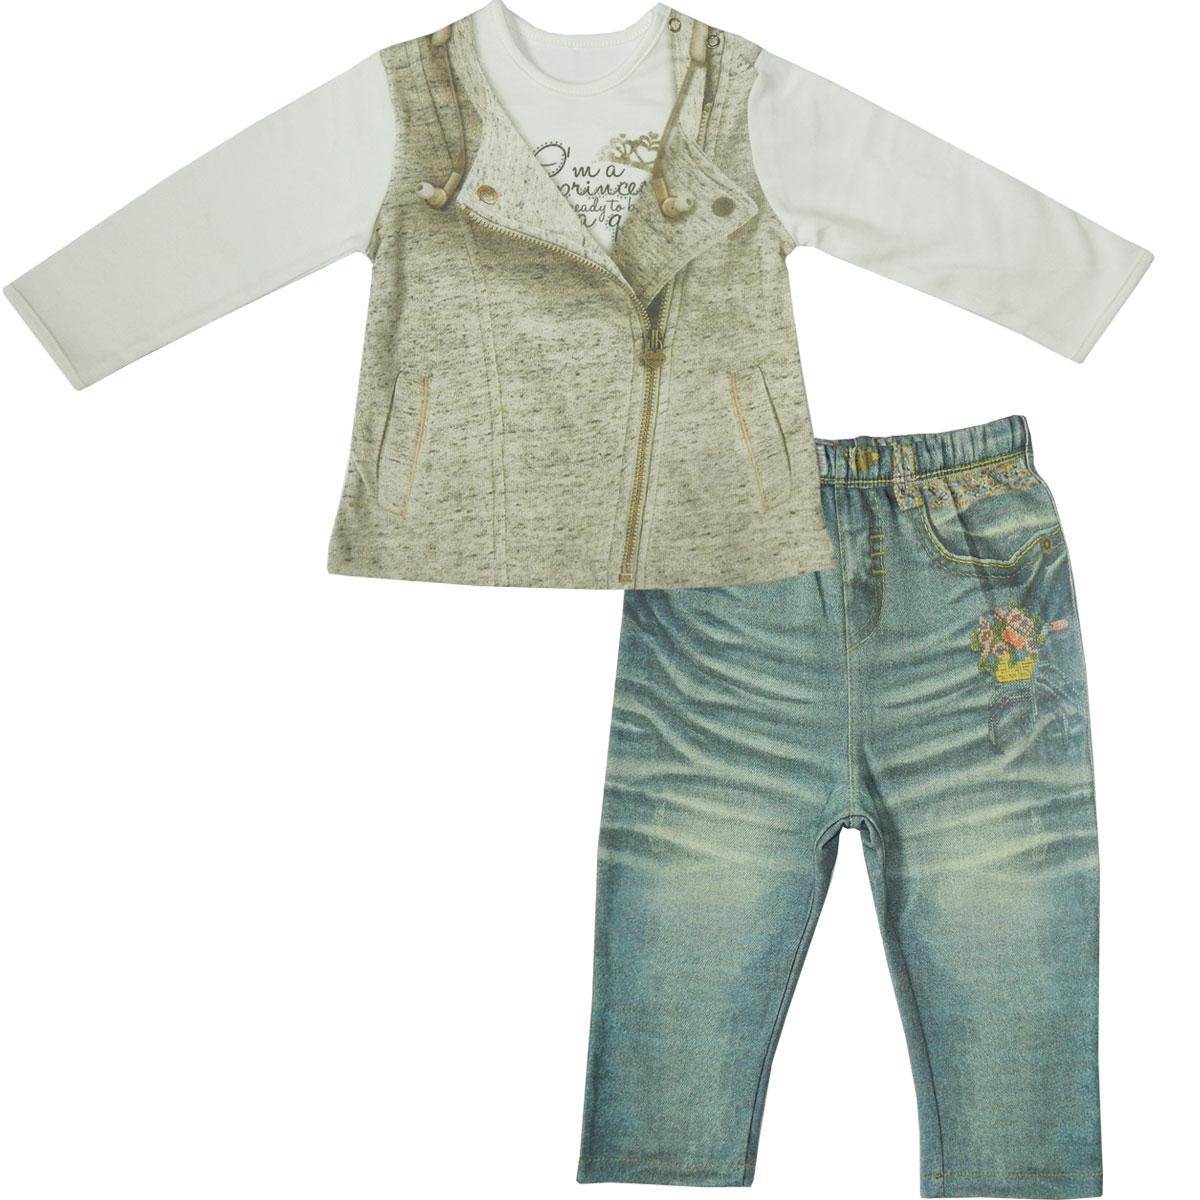 Комплект одежды Папитто для девочки Fashion Jeans 595-05 белый/синий р.26-92